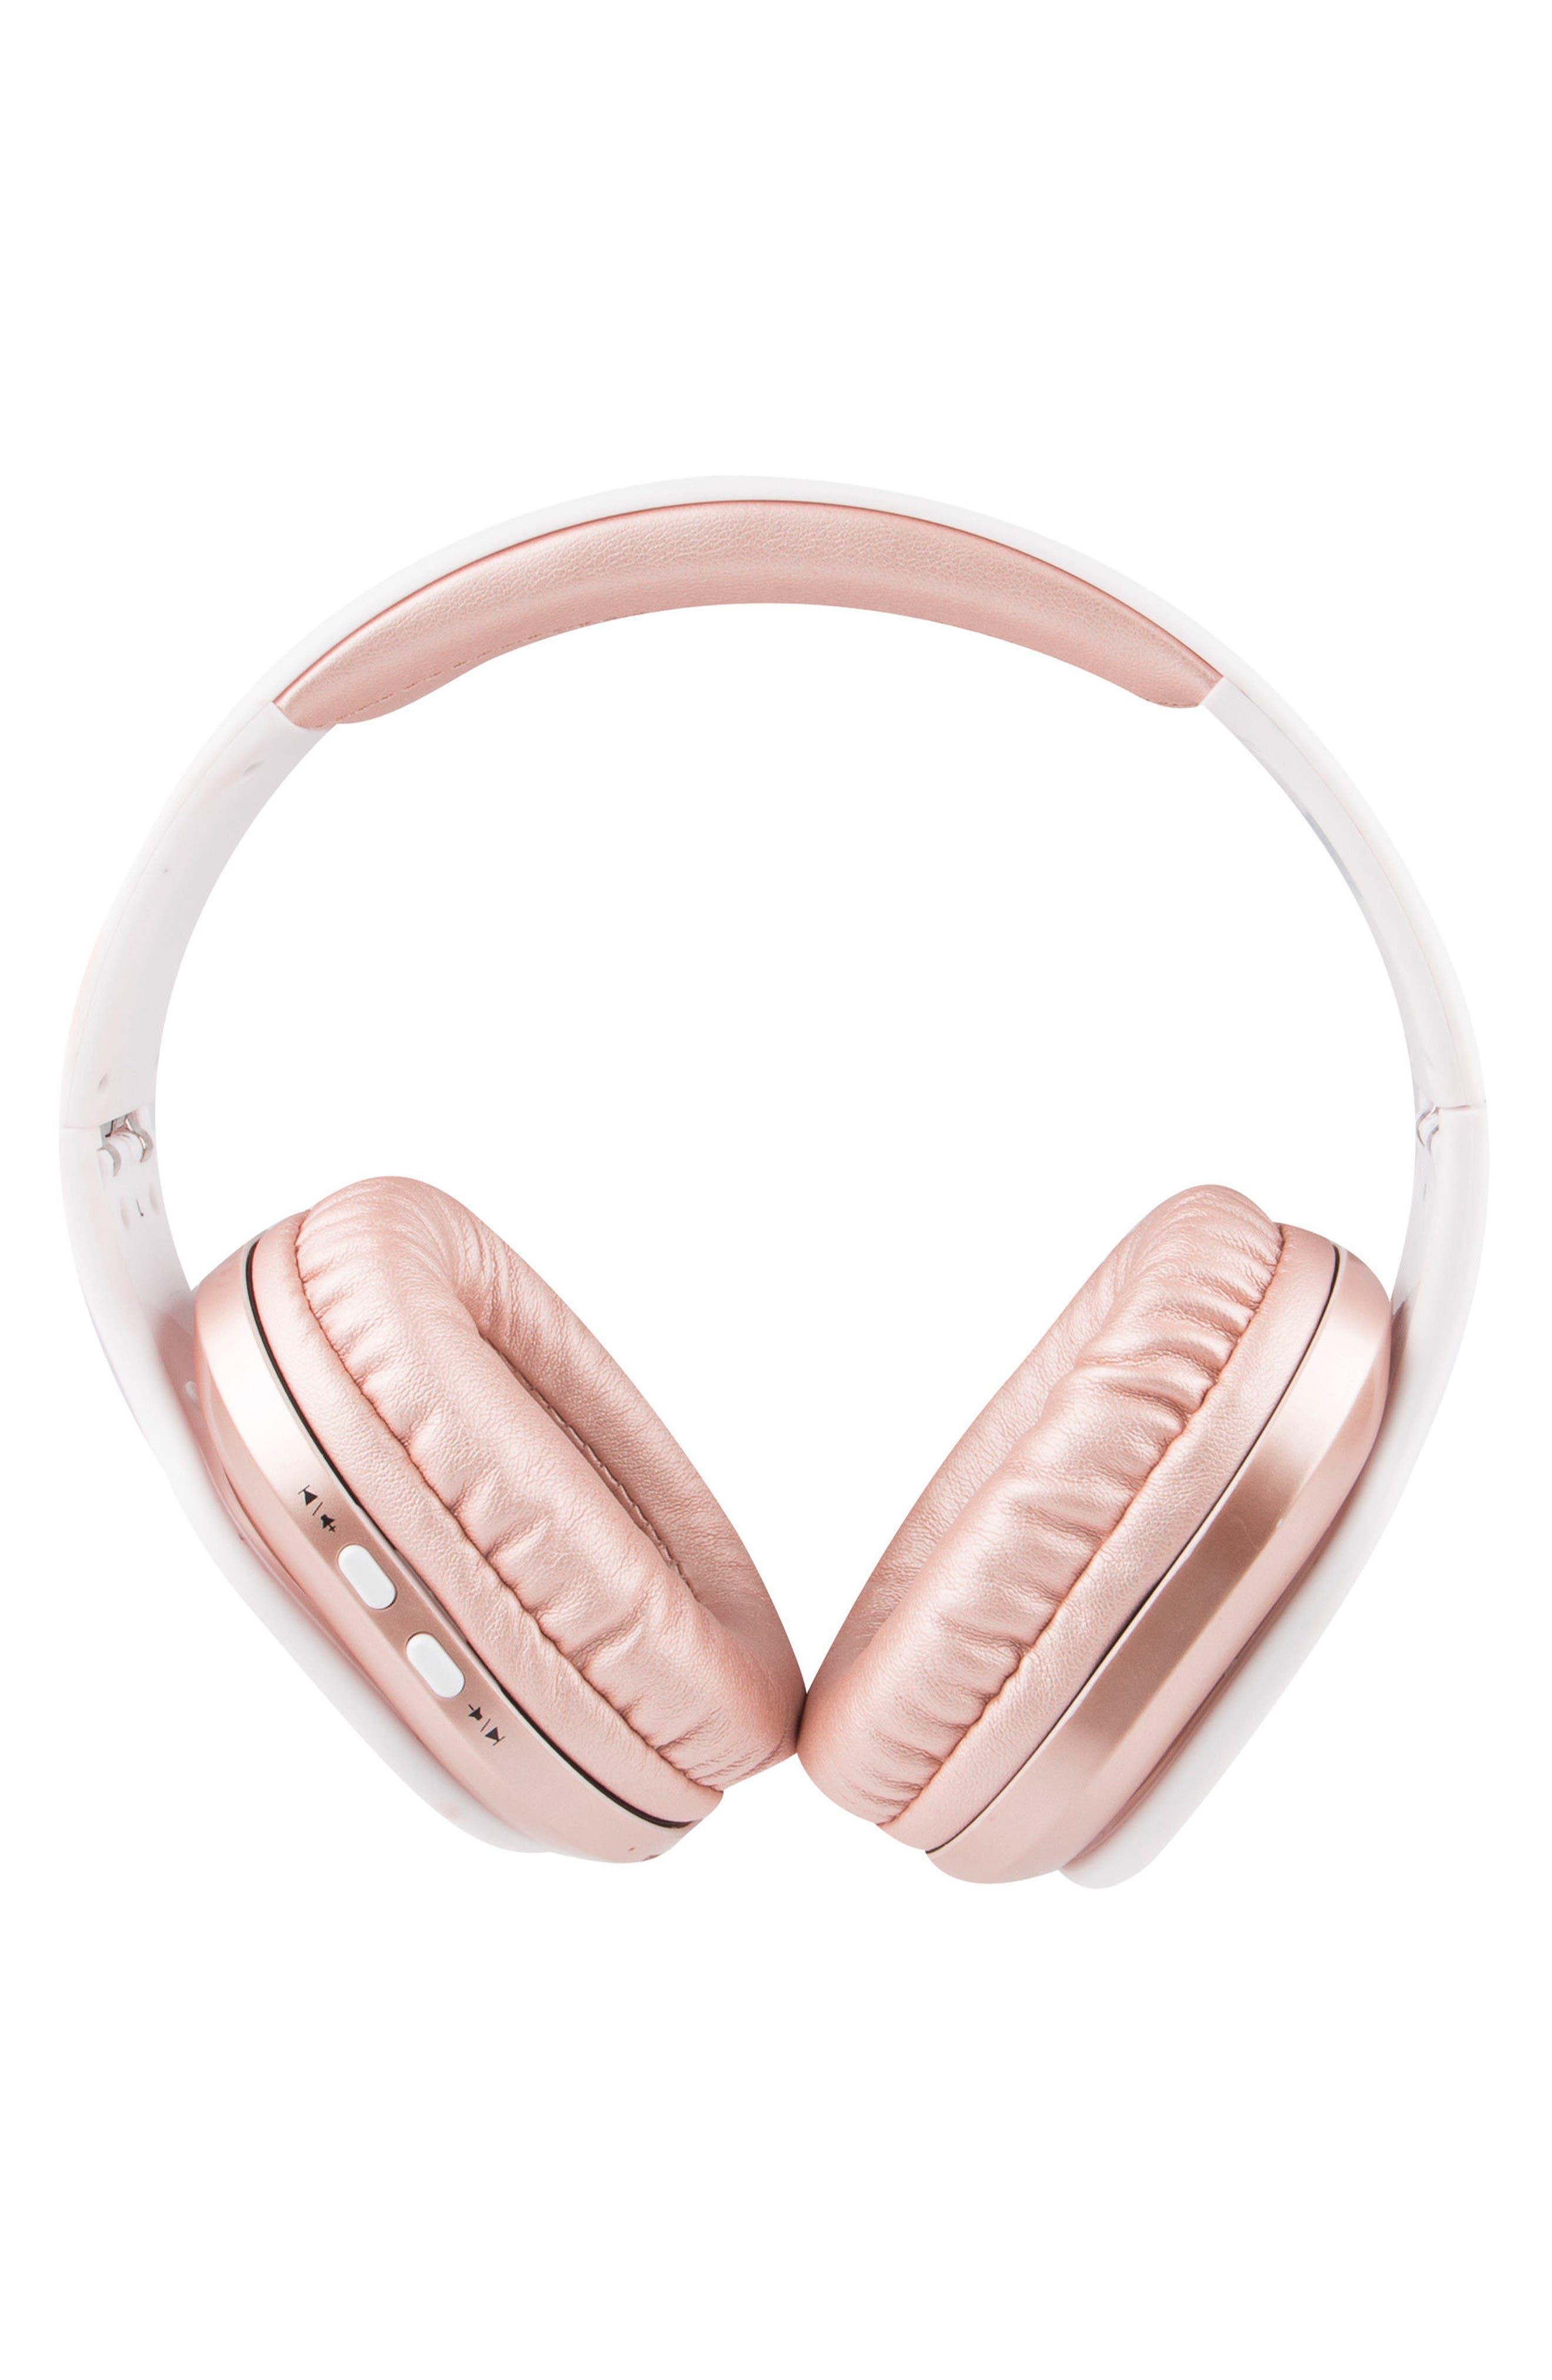 ALTEC LANSING Evolution 2 Wireless Headphones, Main, color, ROSE GOLD